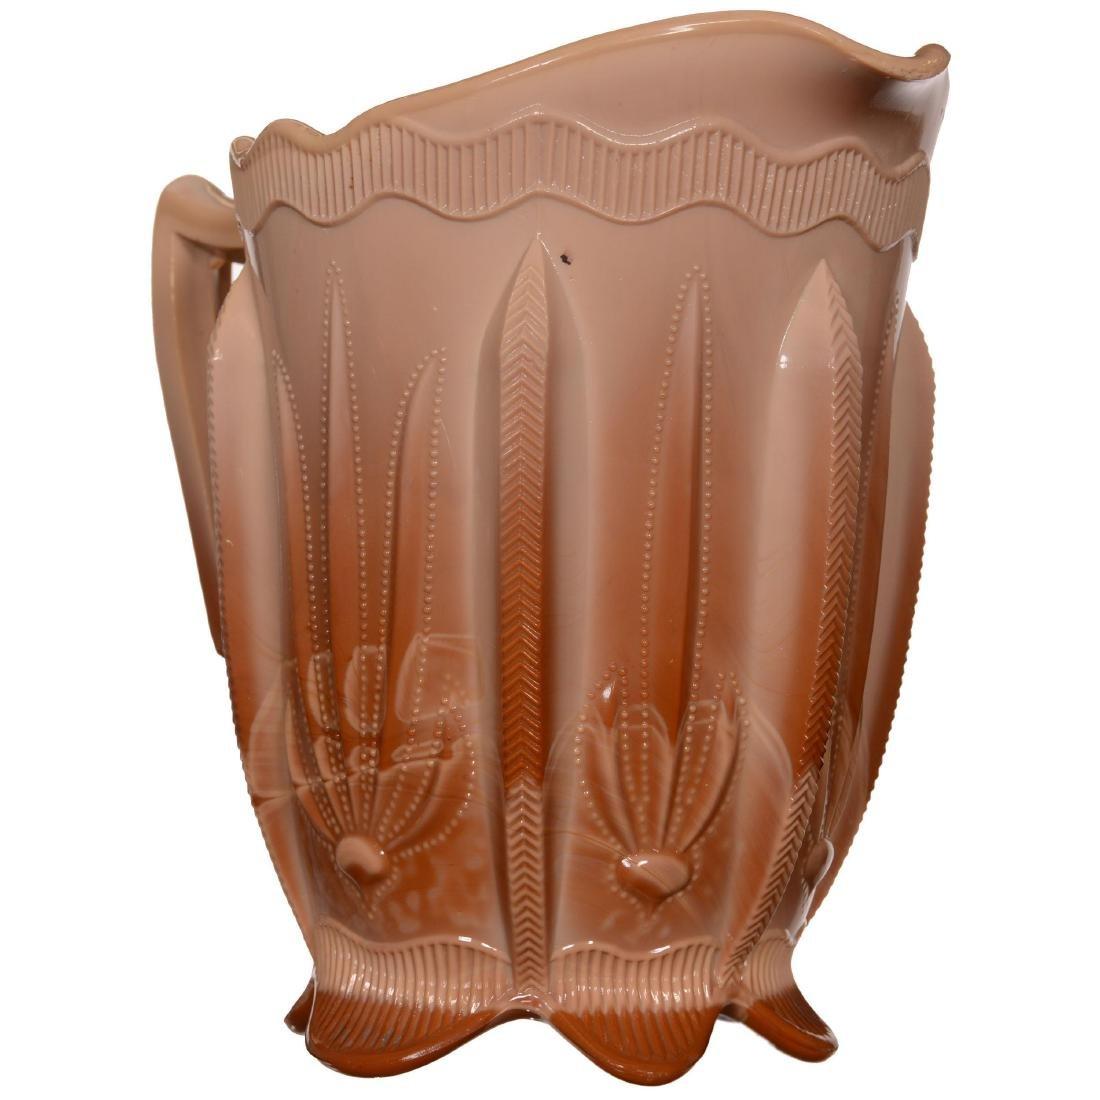 Original Greentown Chocolate Glass Water Set - 2